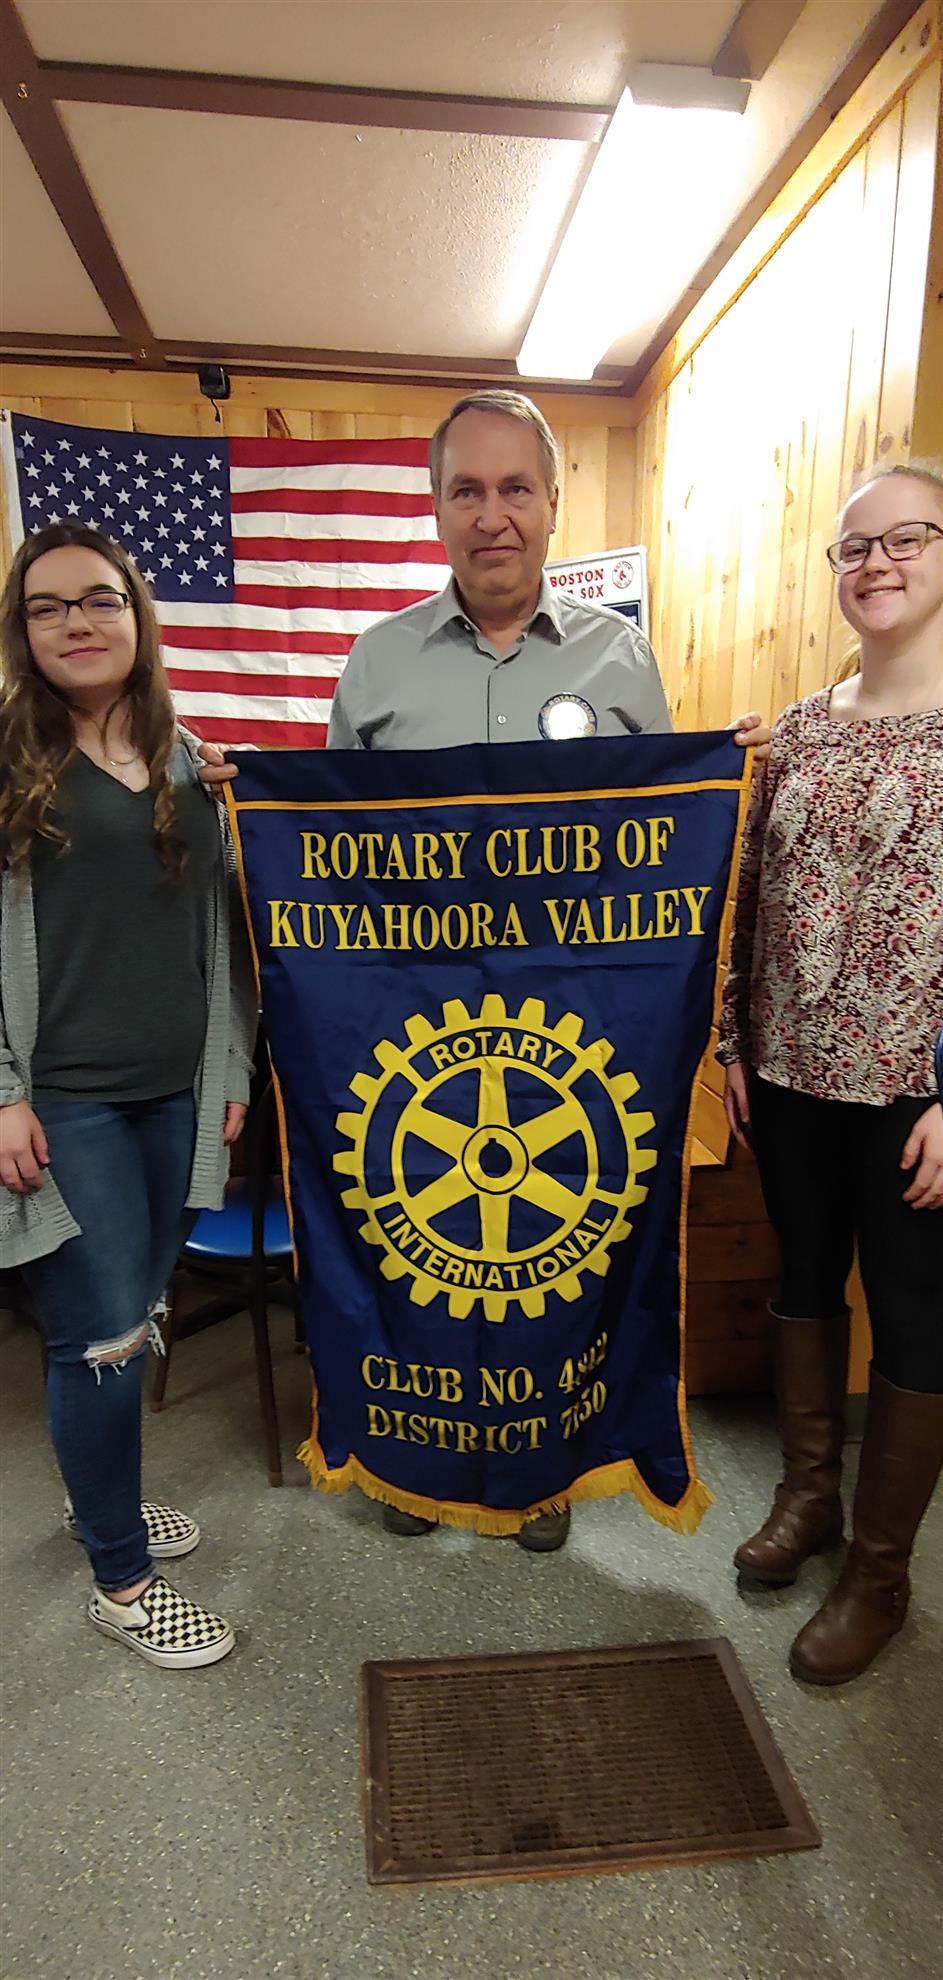 Stories | Rotary Club of Kuyahoora Valley - Newport